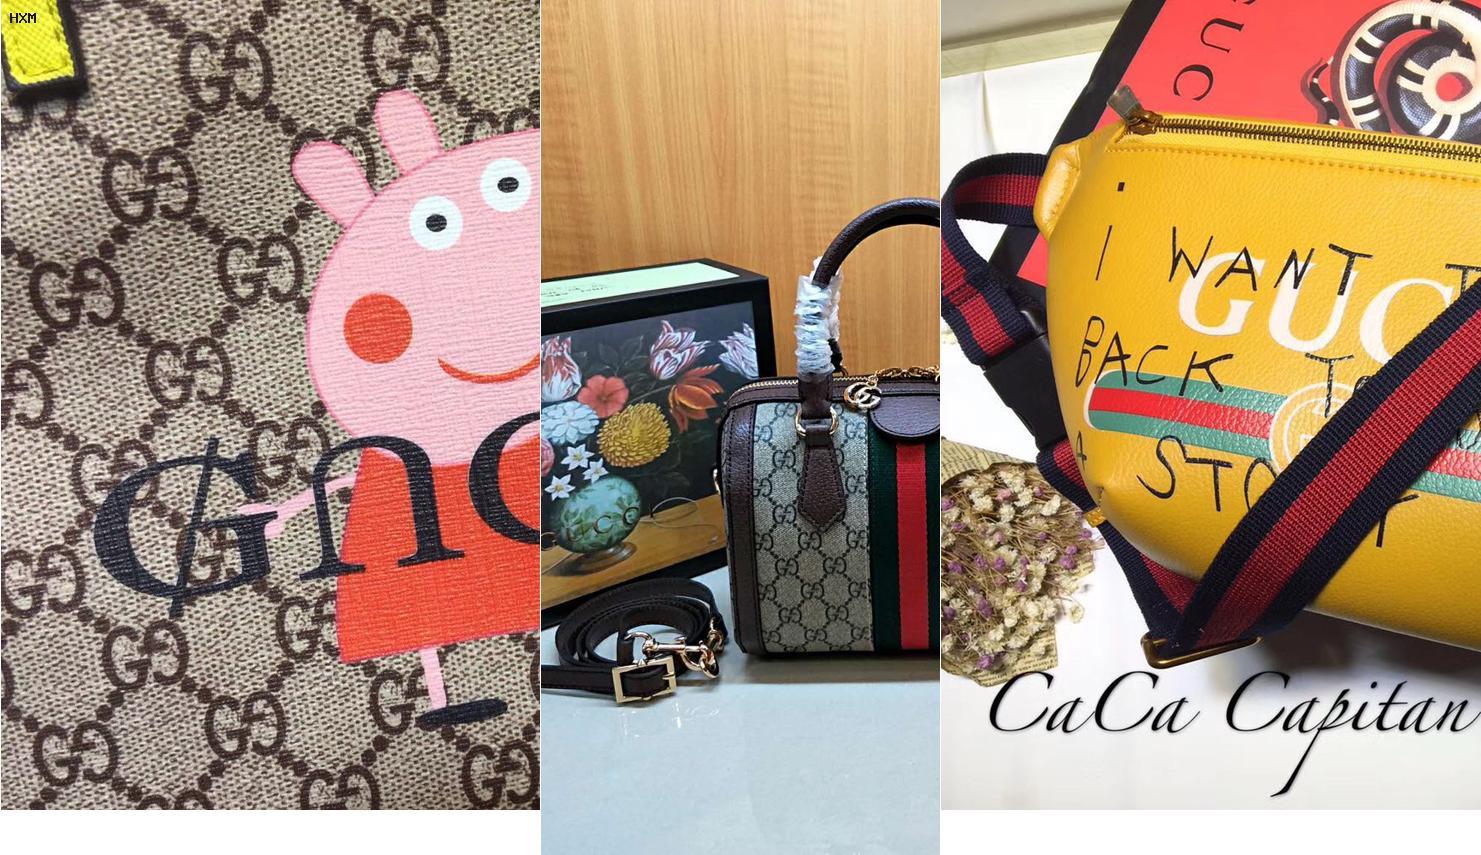 gucci taschen outlet online shop